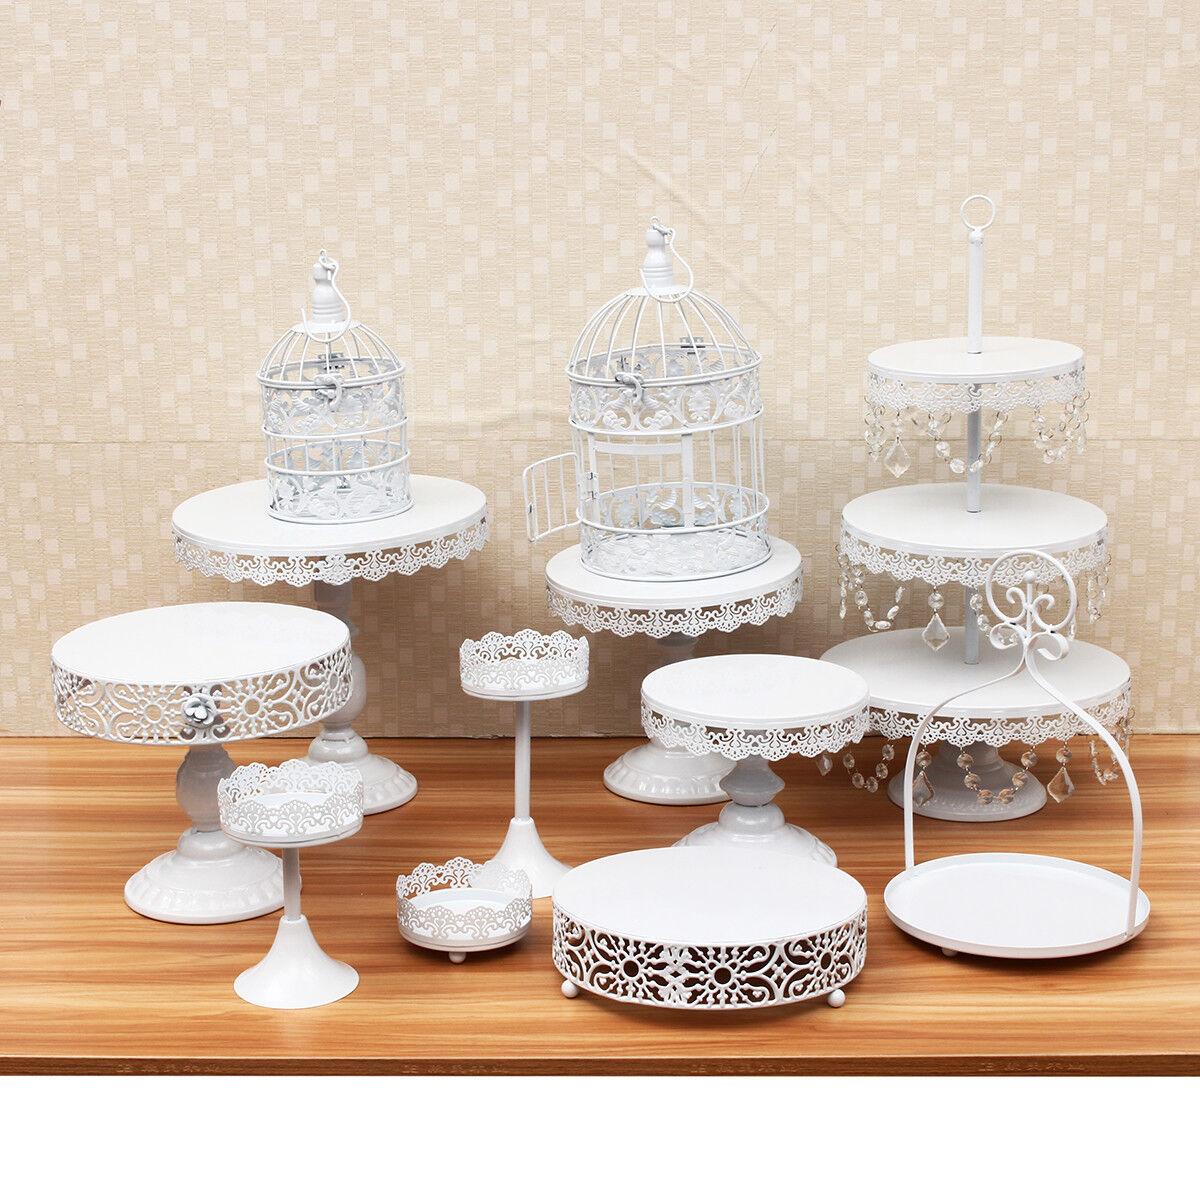 12Pc White Metal Crystal Cake Holder Cupcake Stand Dessert Display ...